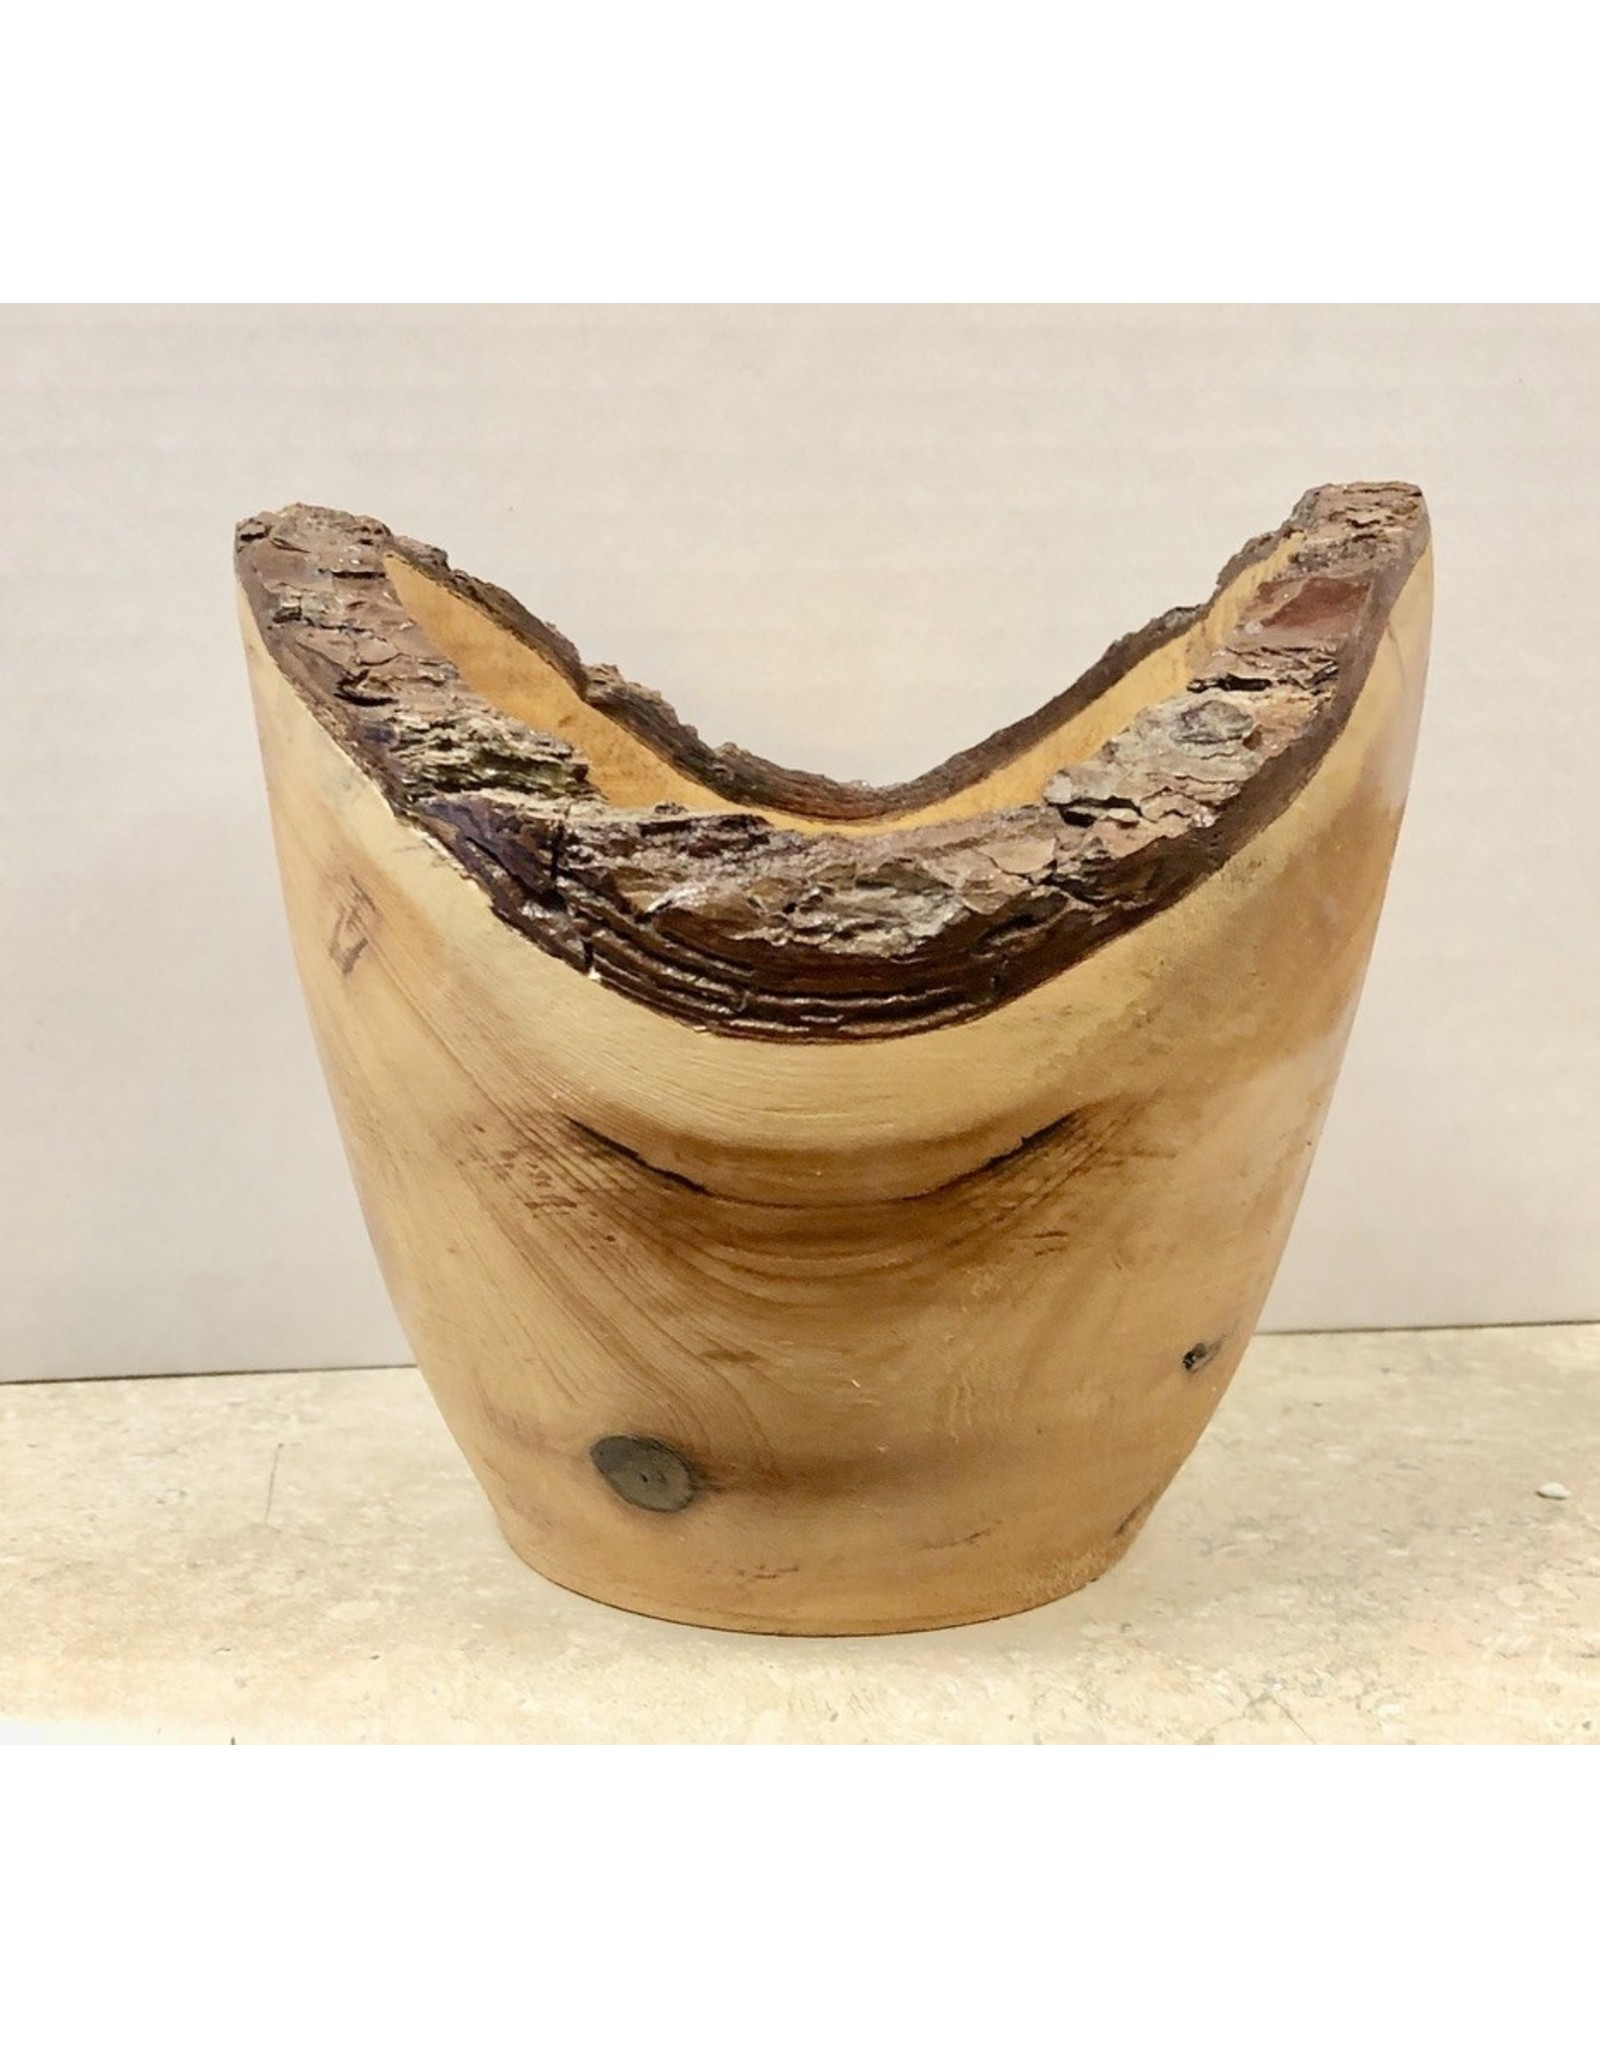 "David L. Jones Bowl (Natural Edge Pine, 5.5""D. x 5""H)"